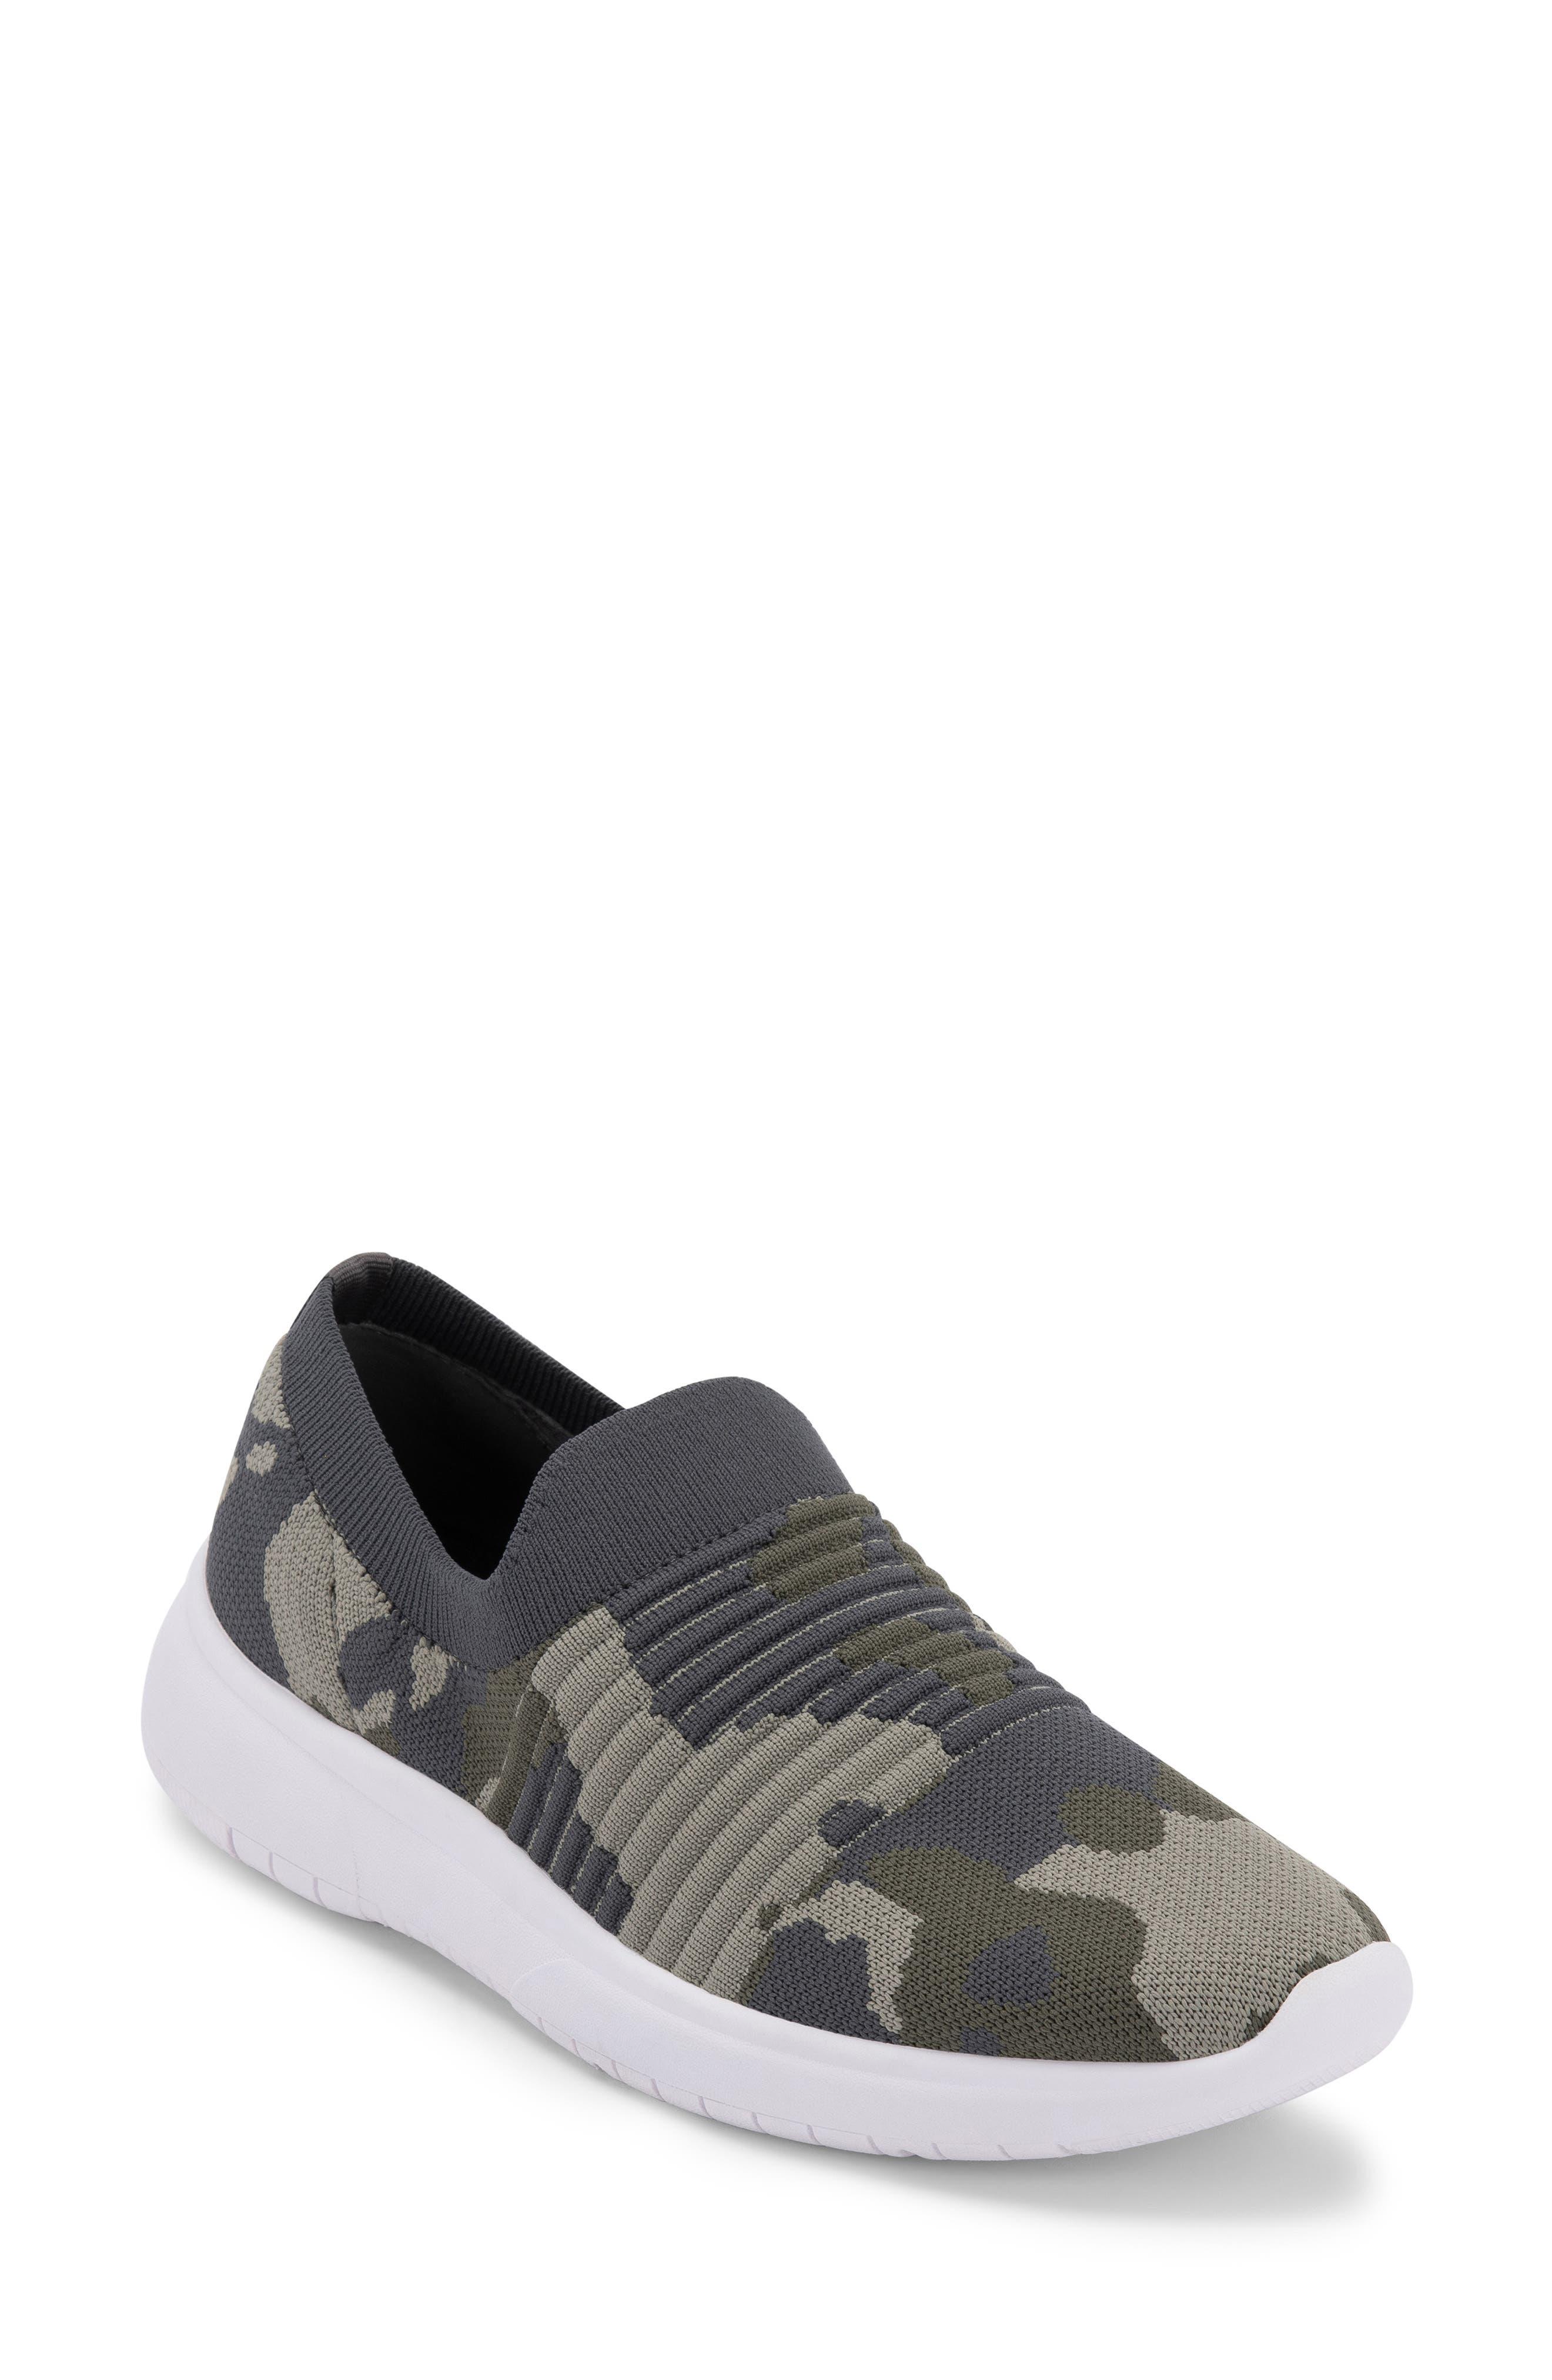 Karen Waterproof Slip-On Sneaker